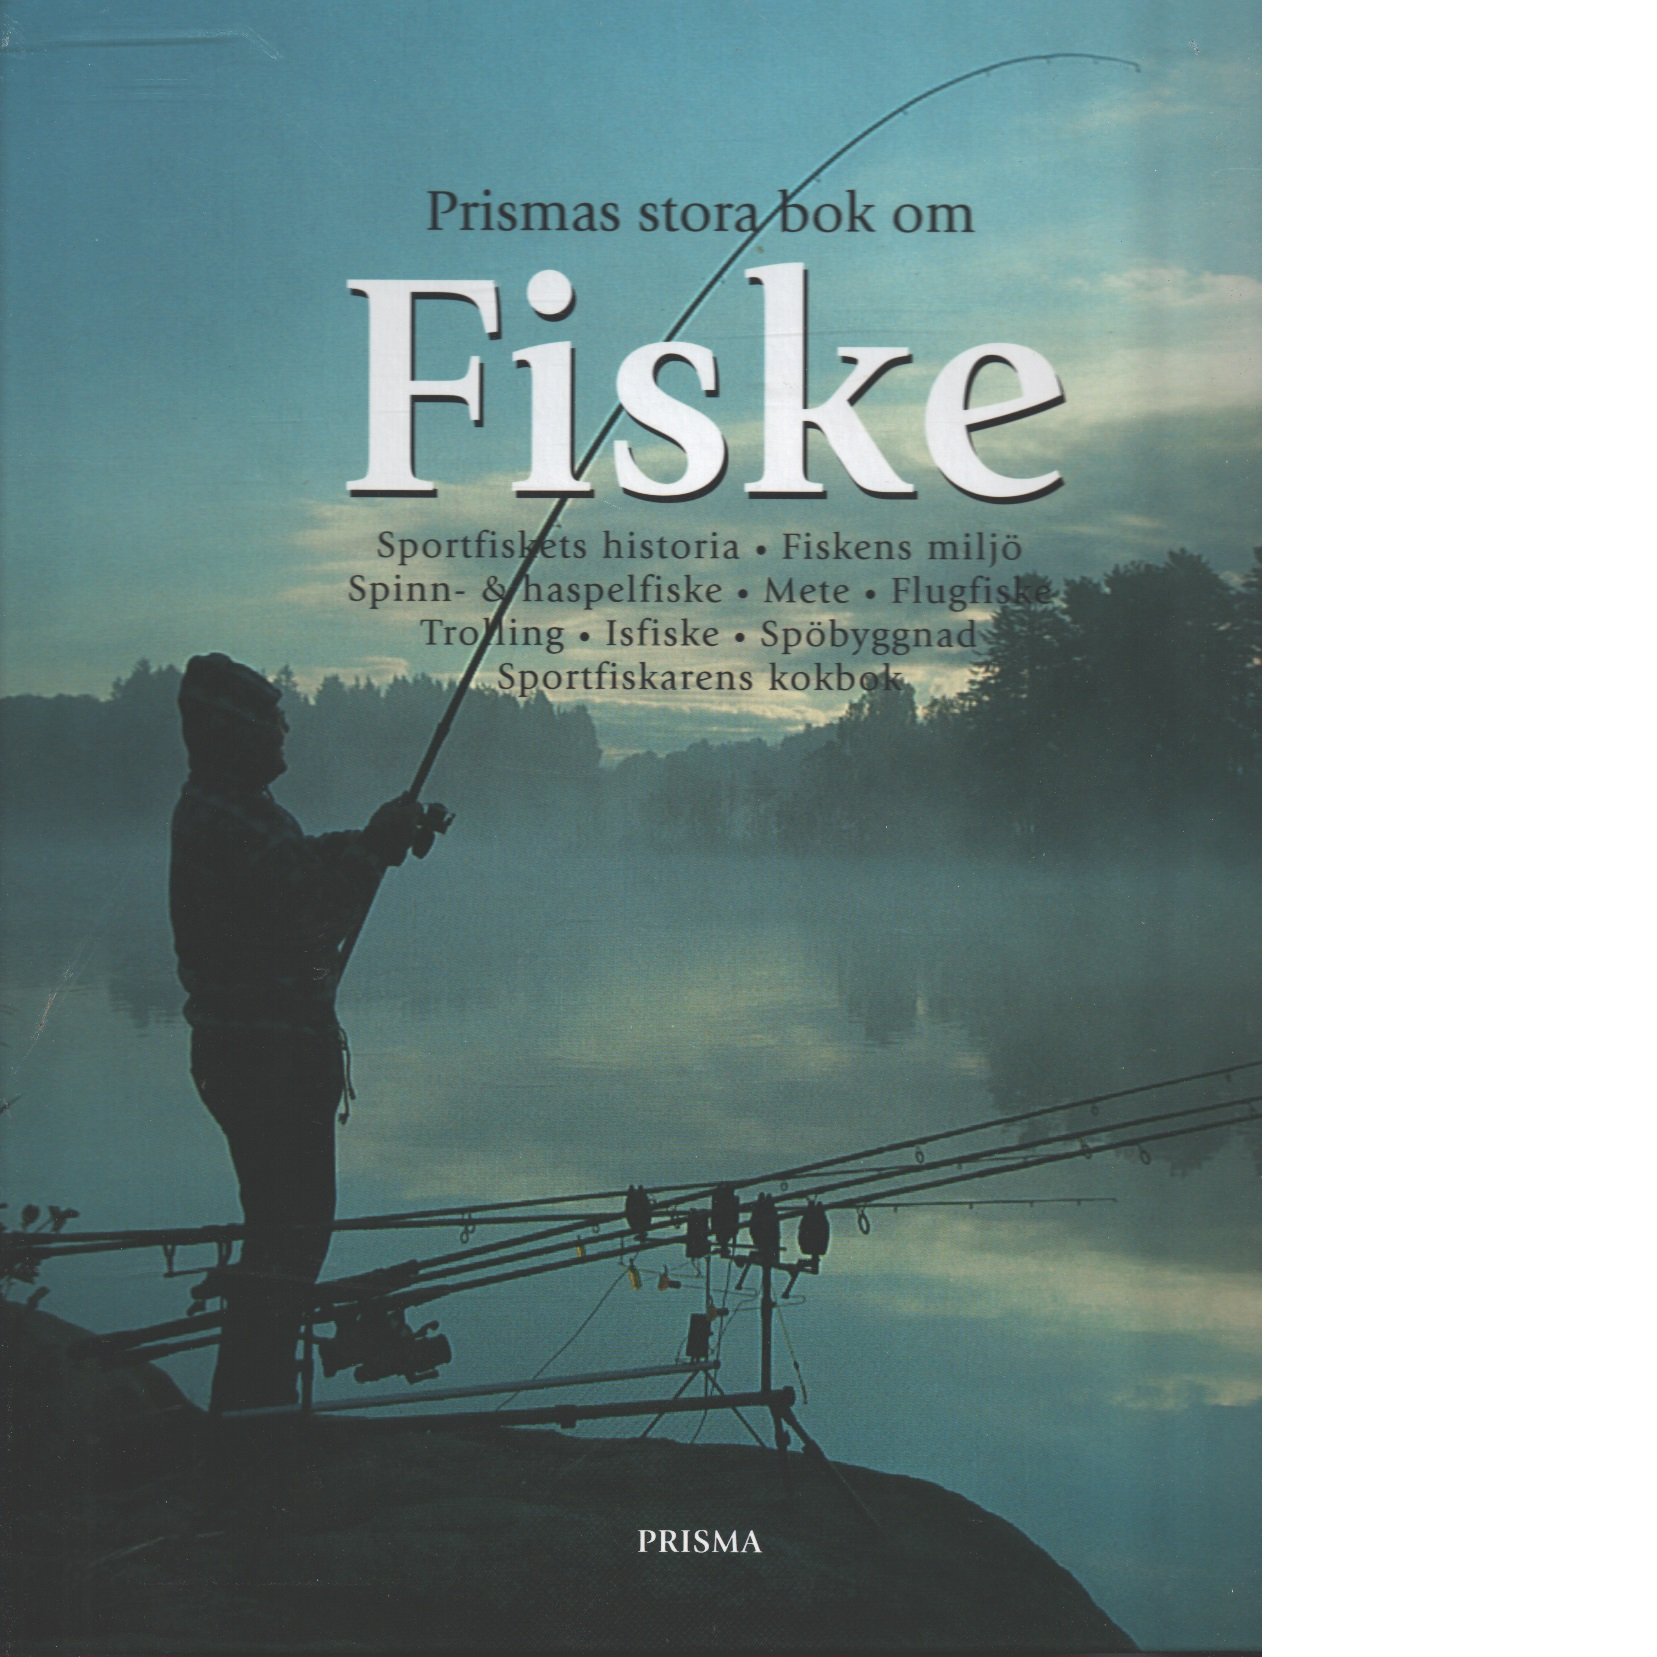 Prismas stora bok om fiske - Red.